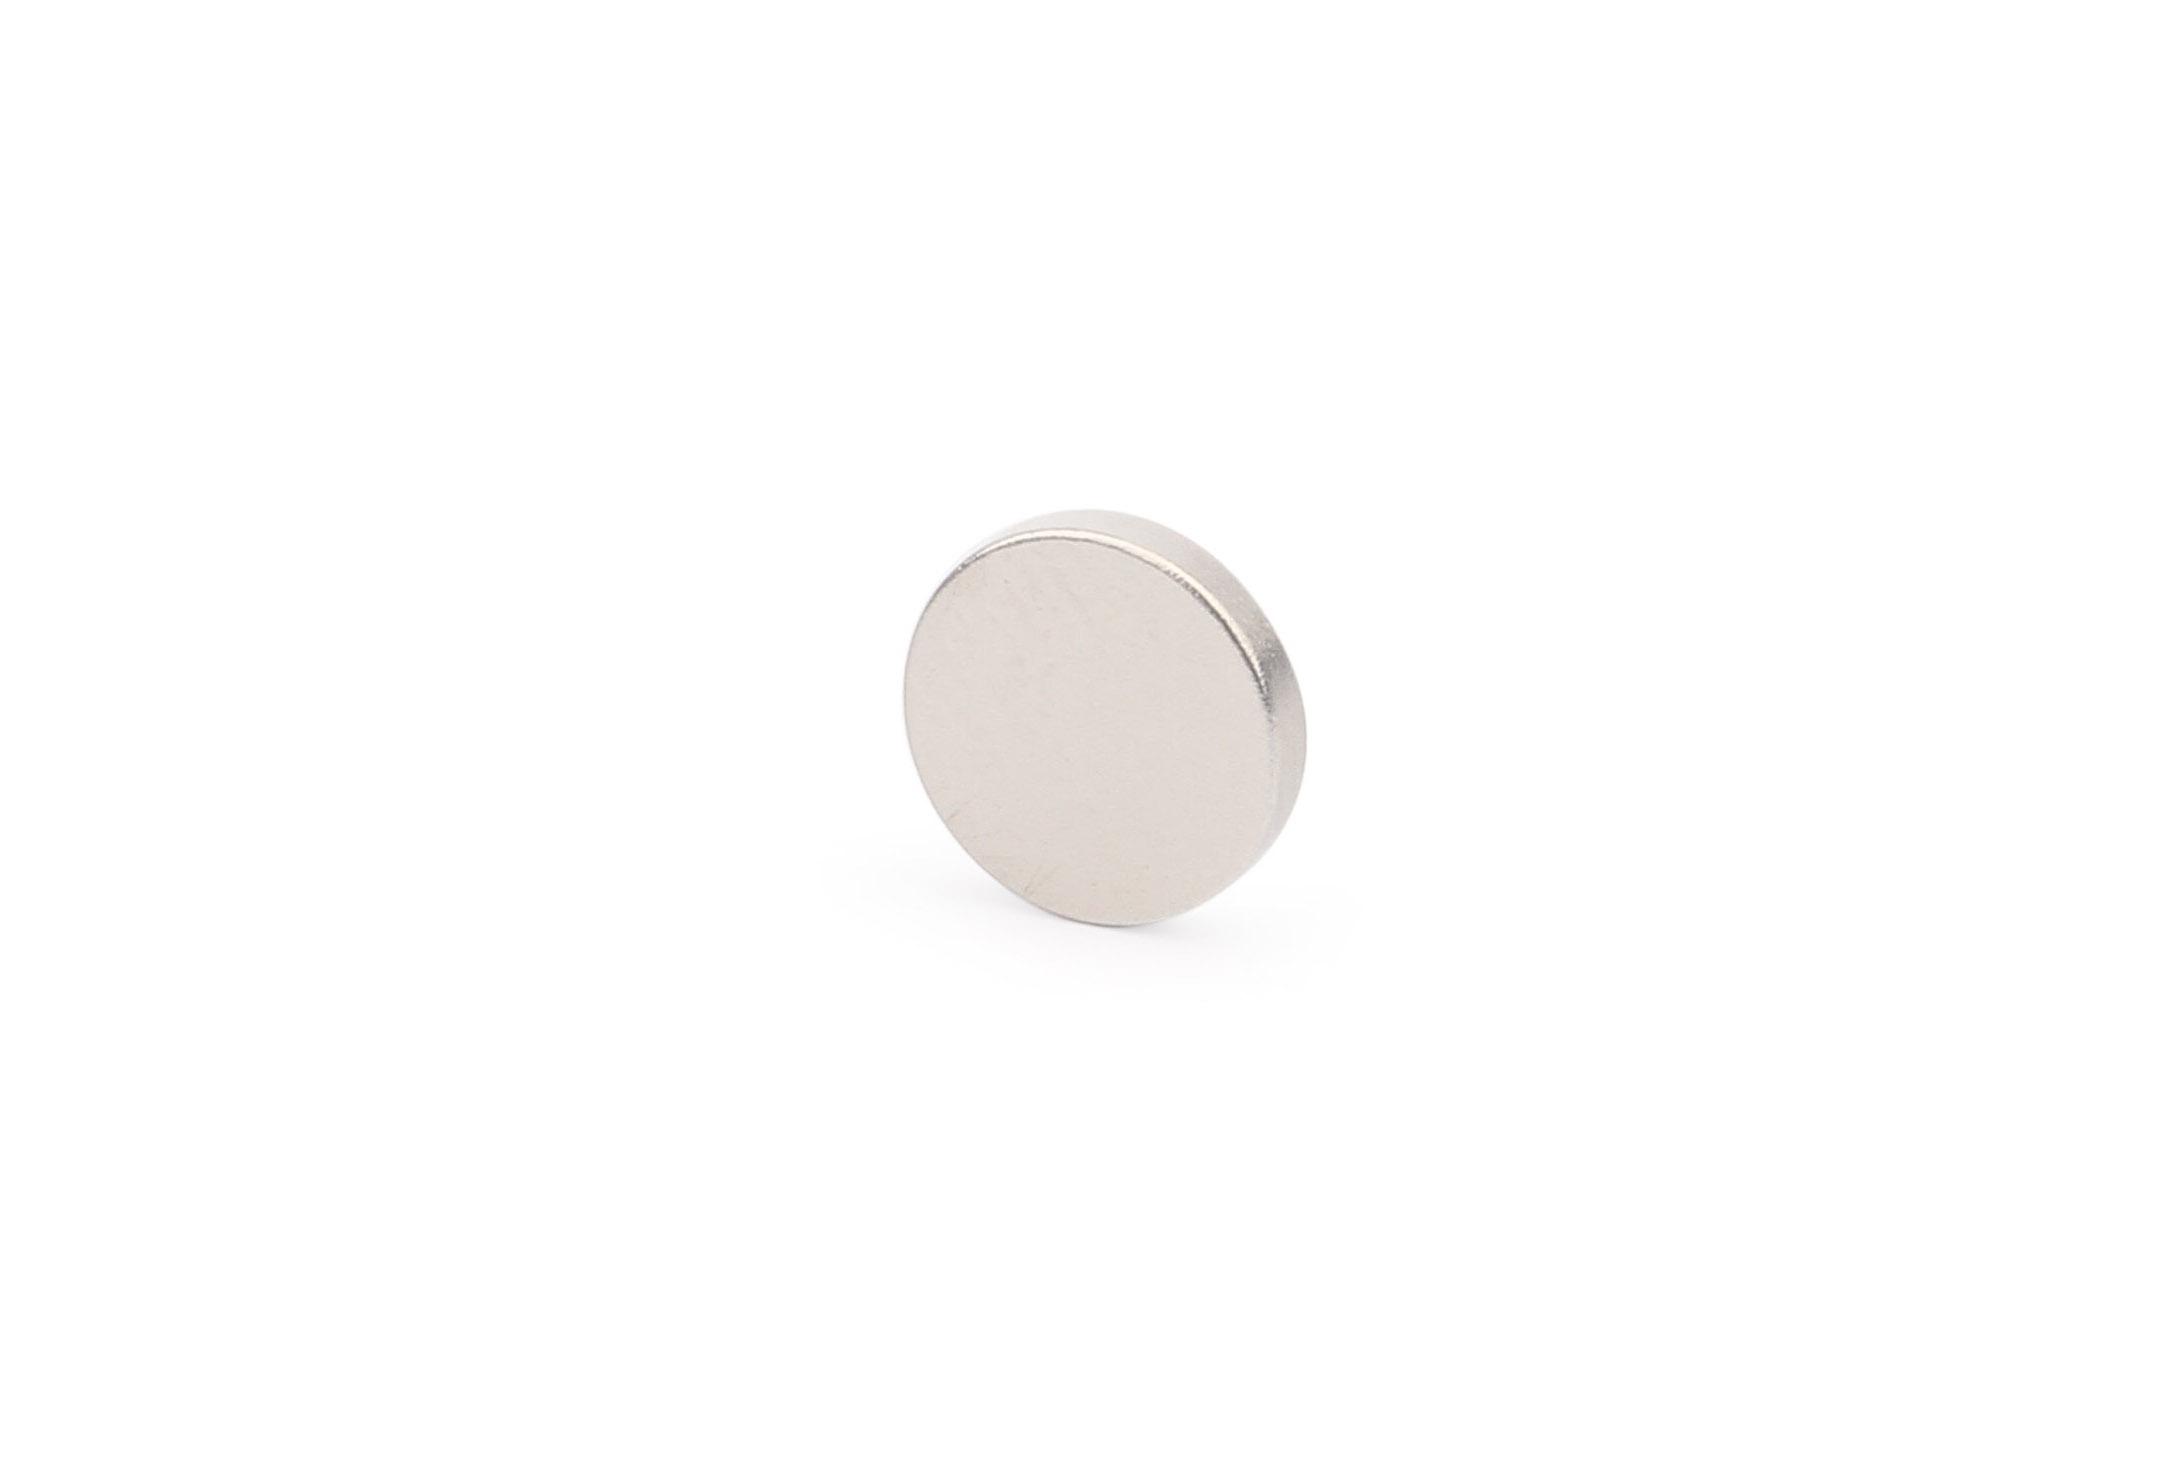 Неодимовый магнит диск 8х1.5 мм